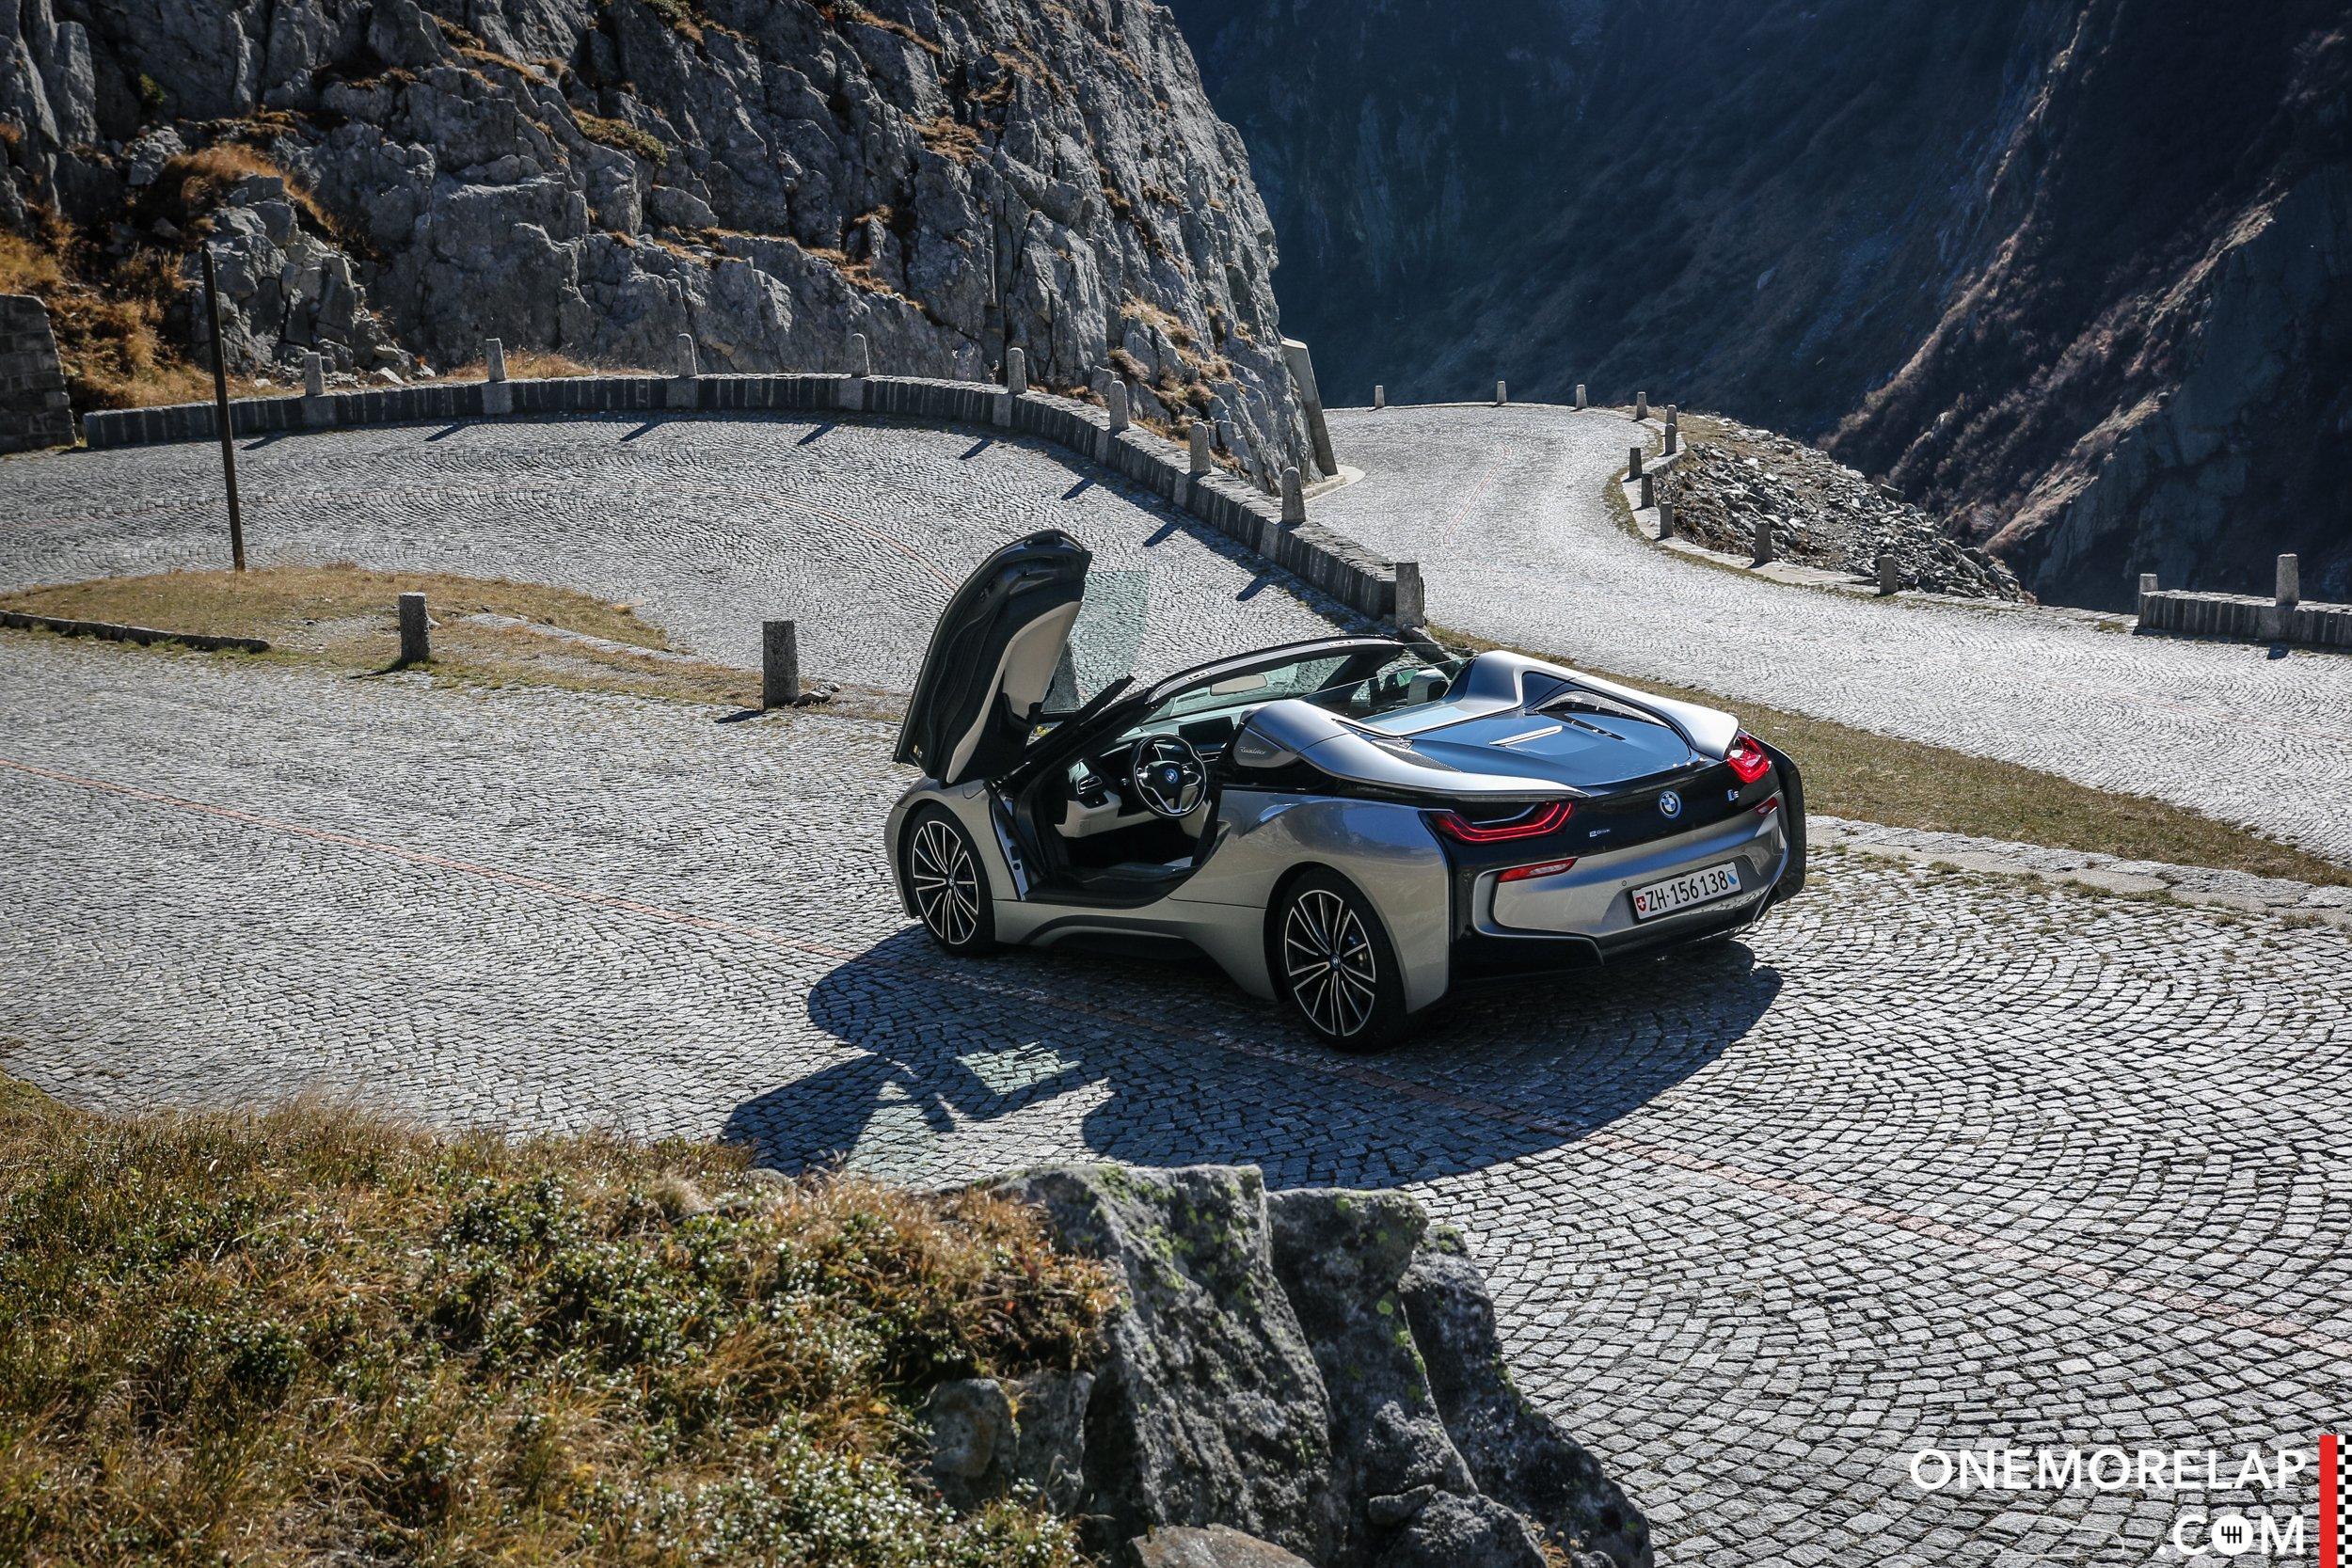 Fahrbericht: BMW i8 Roadster (Schweizer Pässe Roadtrip)